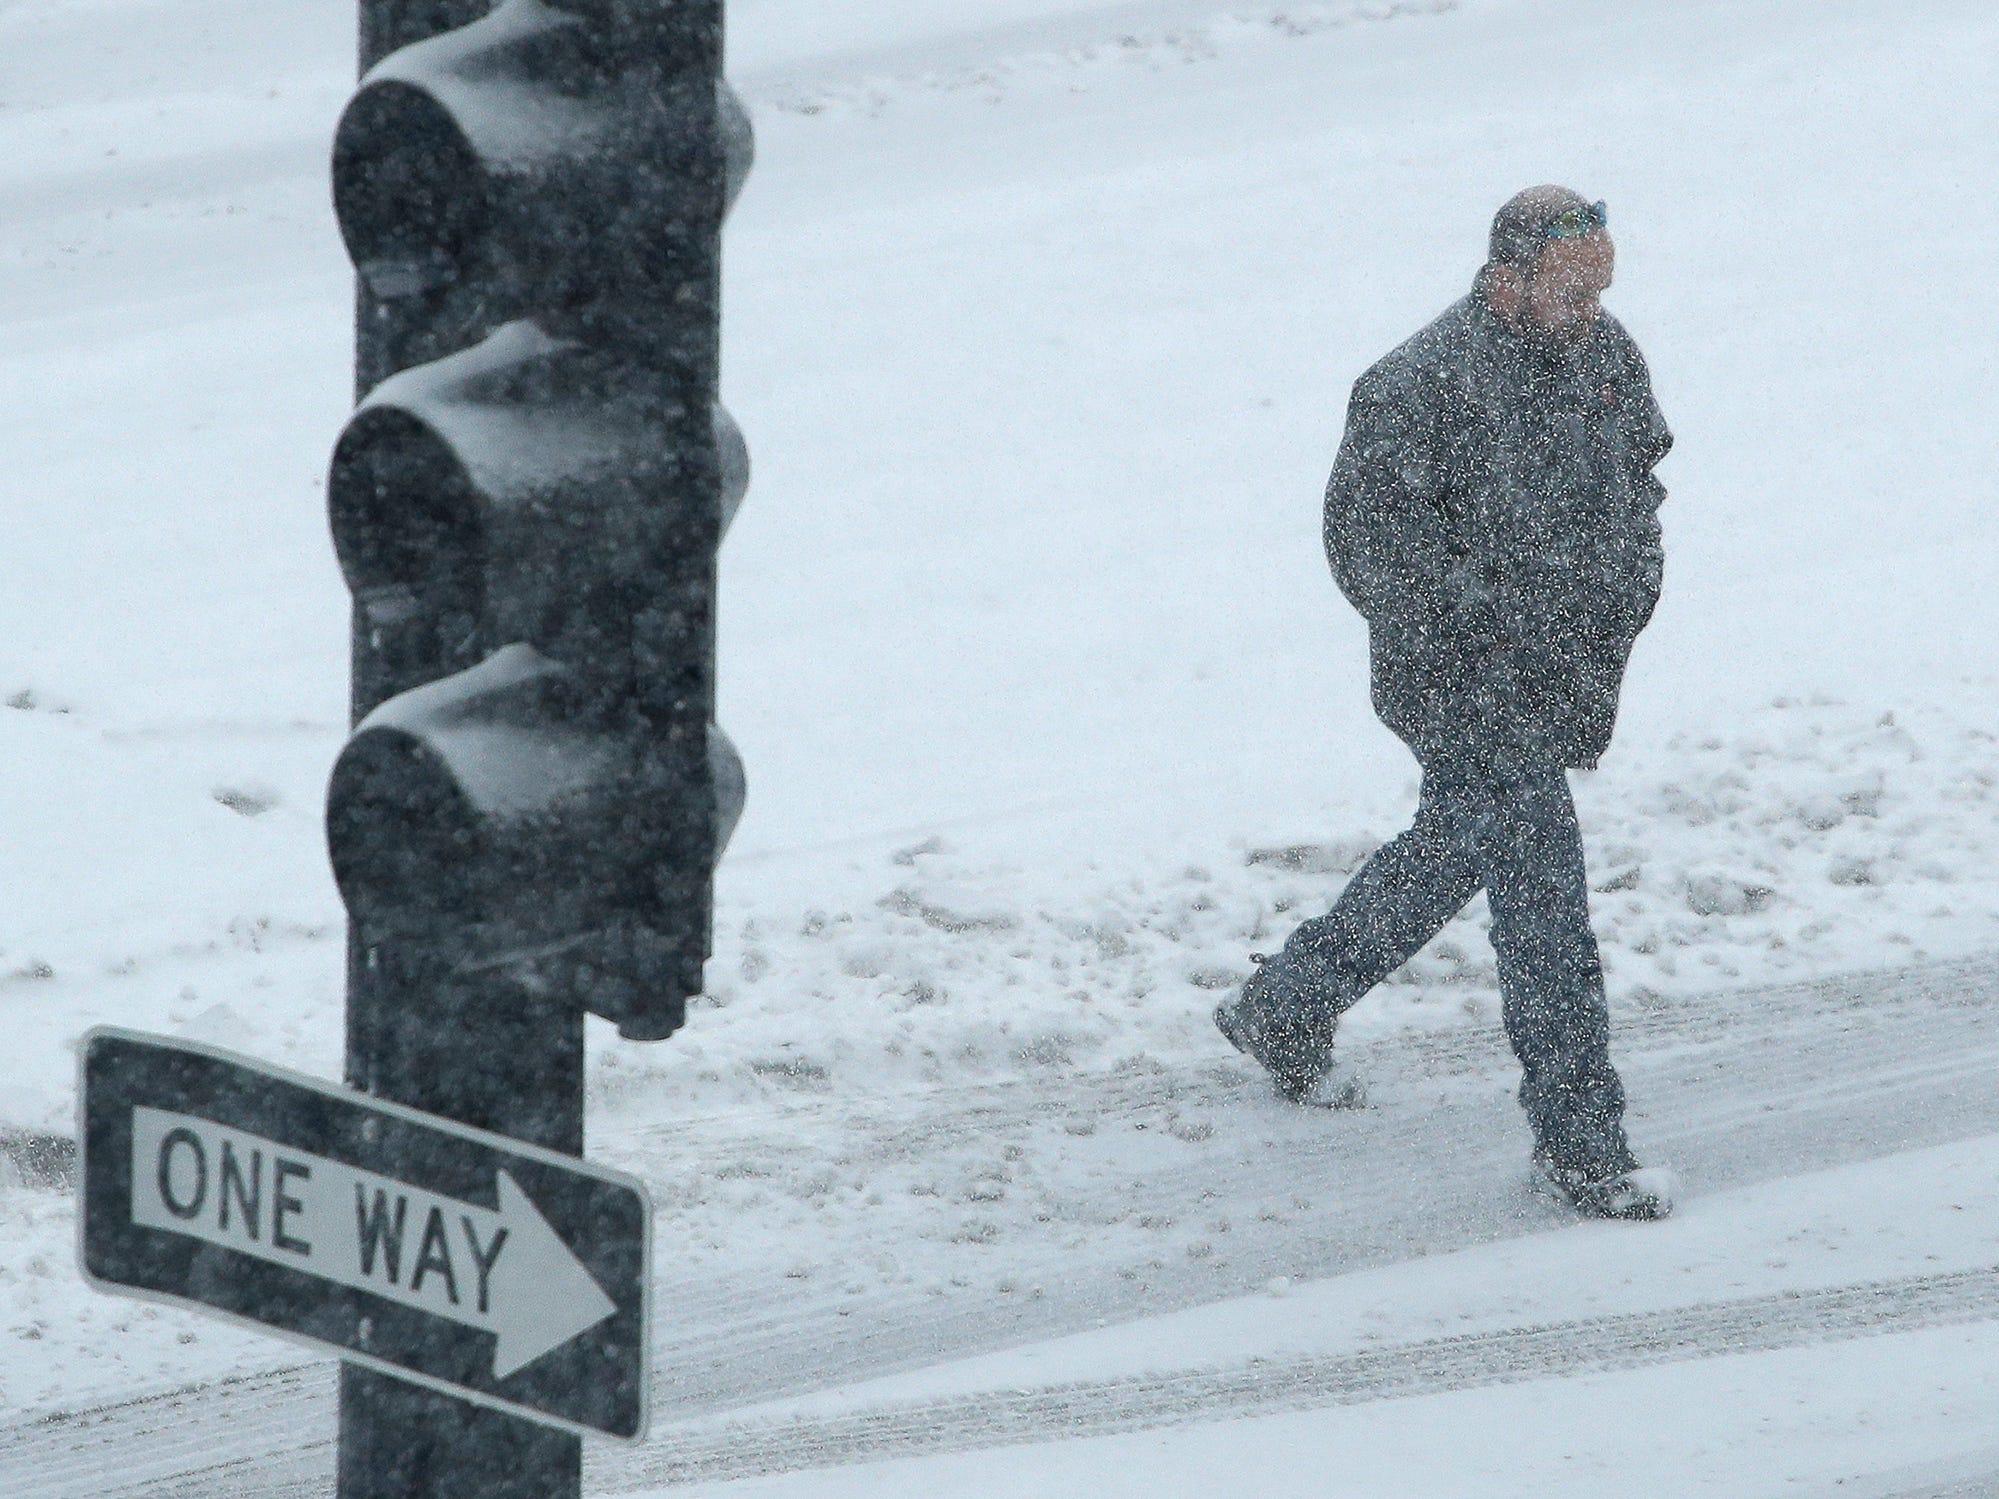 A pedestrian walks as snow falls on Nov. 25, 2018, in downtown Kansas City, Mo.